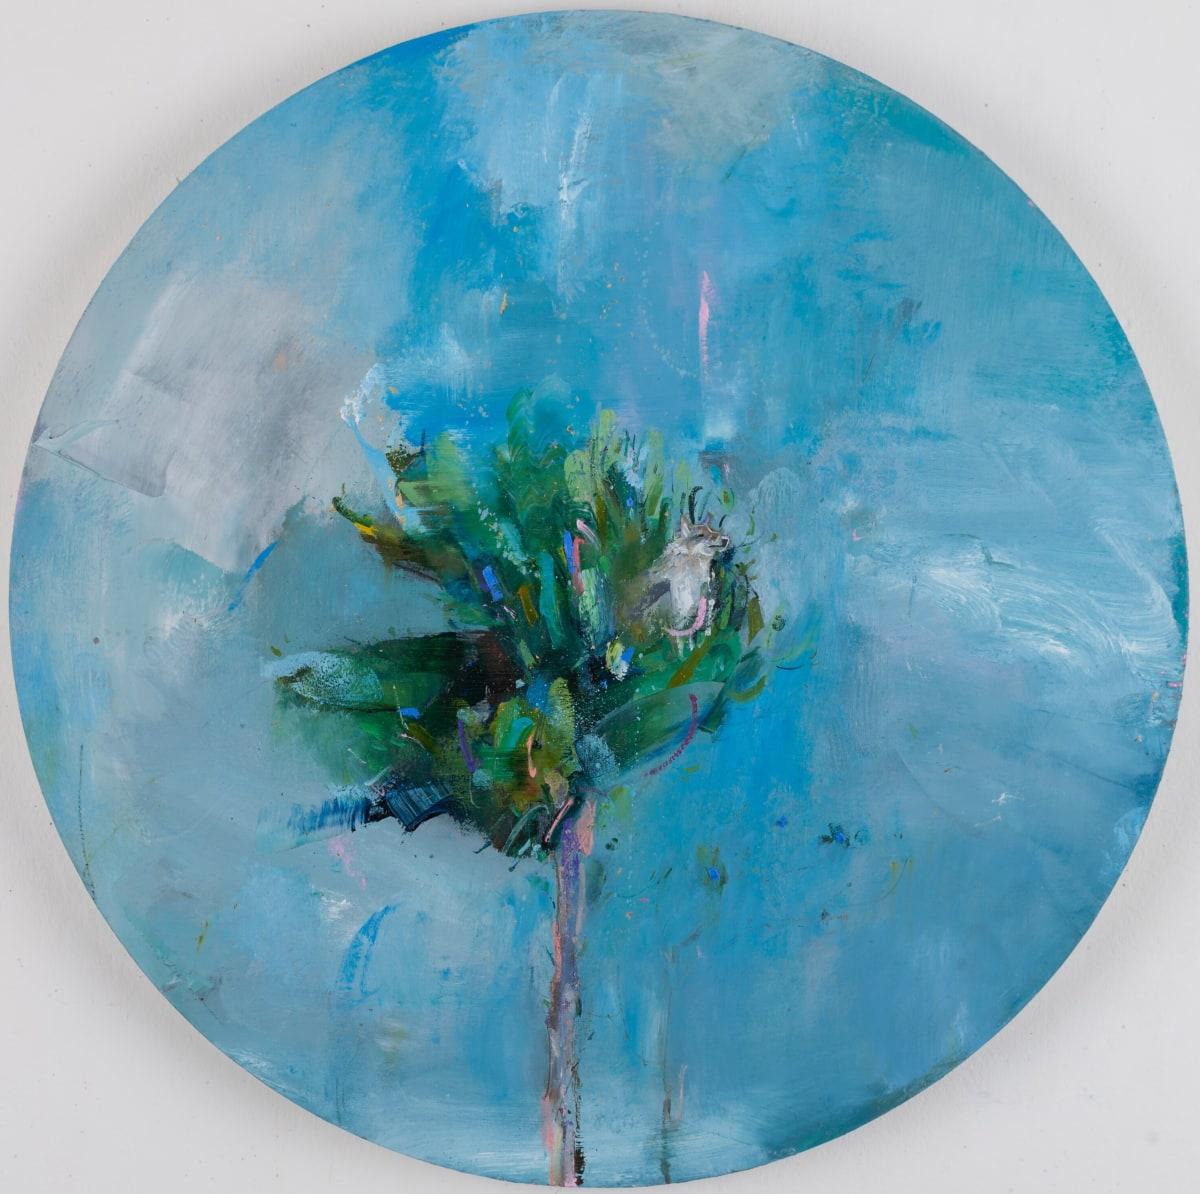 Gabhann Dunne Abelard's wolf Oil on gesso panel 50 cm in diameter